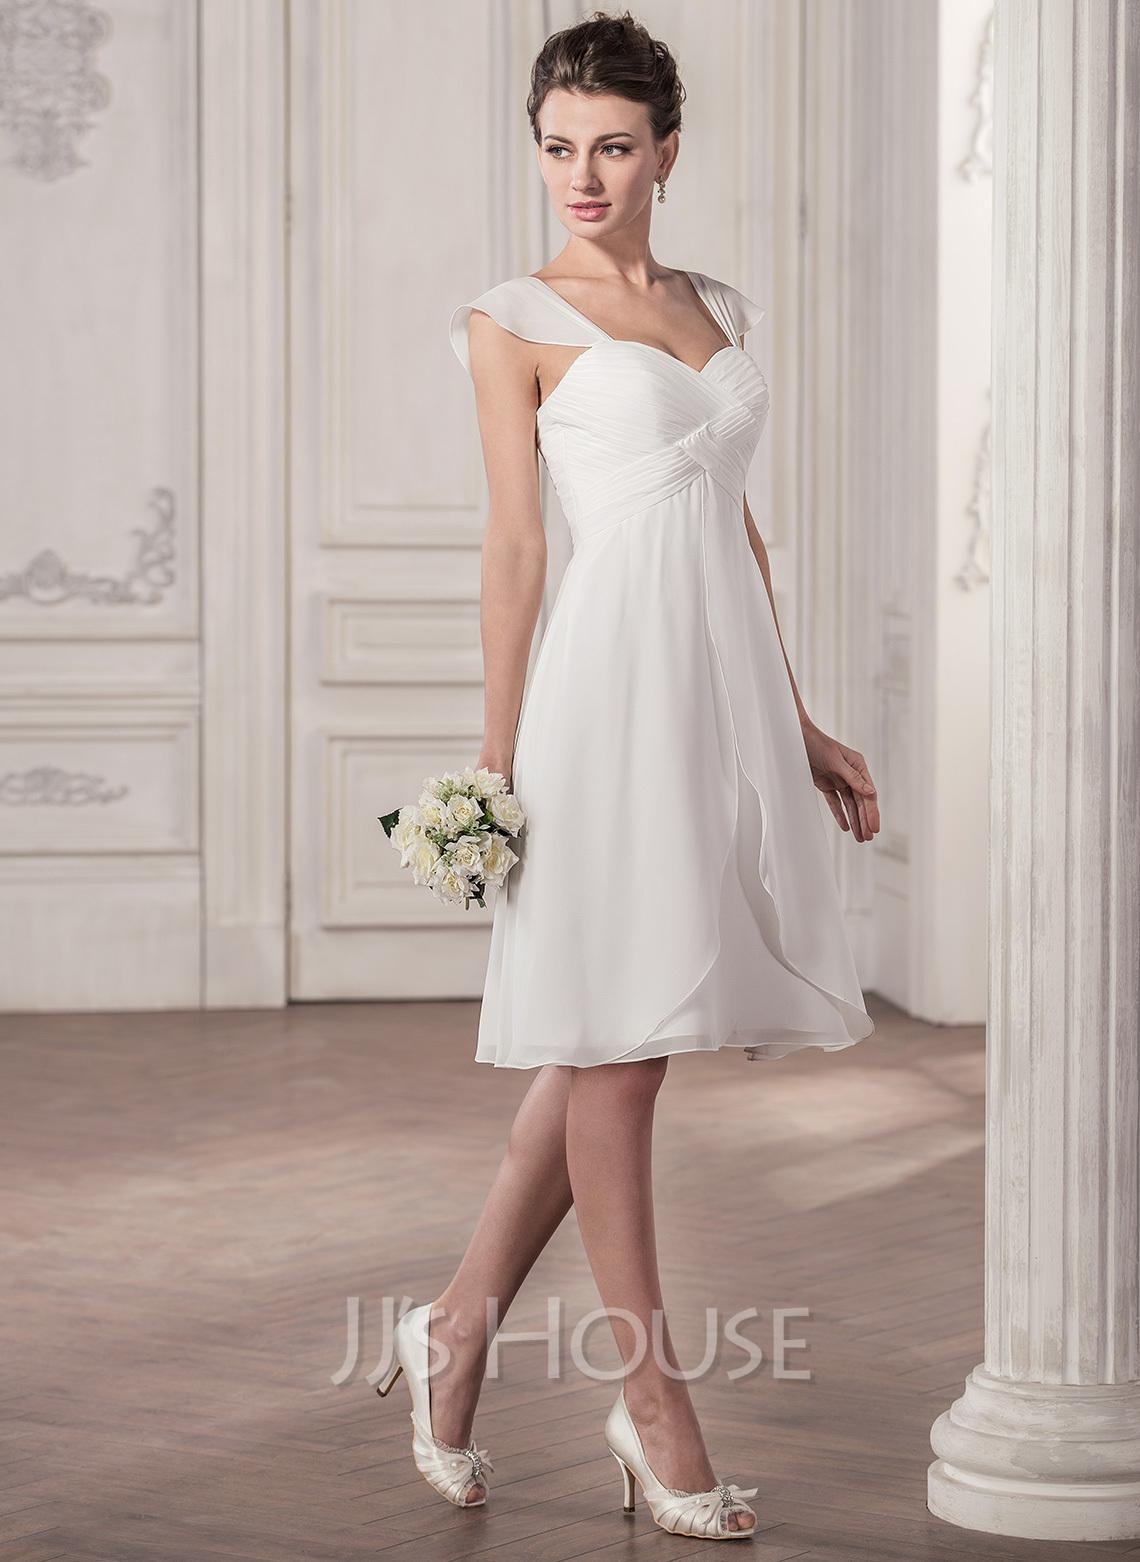 A-Line/Princess Sweetheart Knee-Length Chiffon Wedding Dress With Ruffle